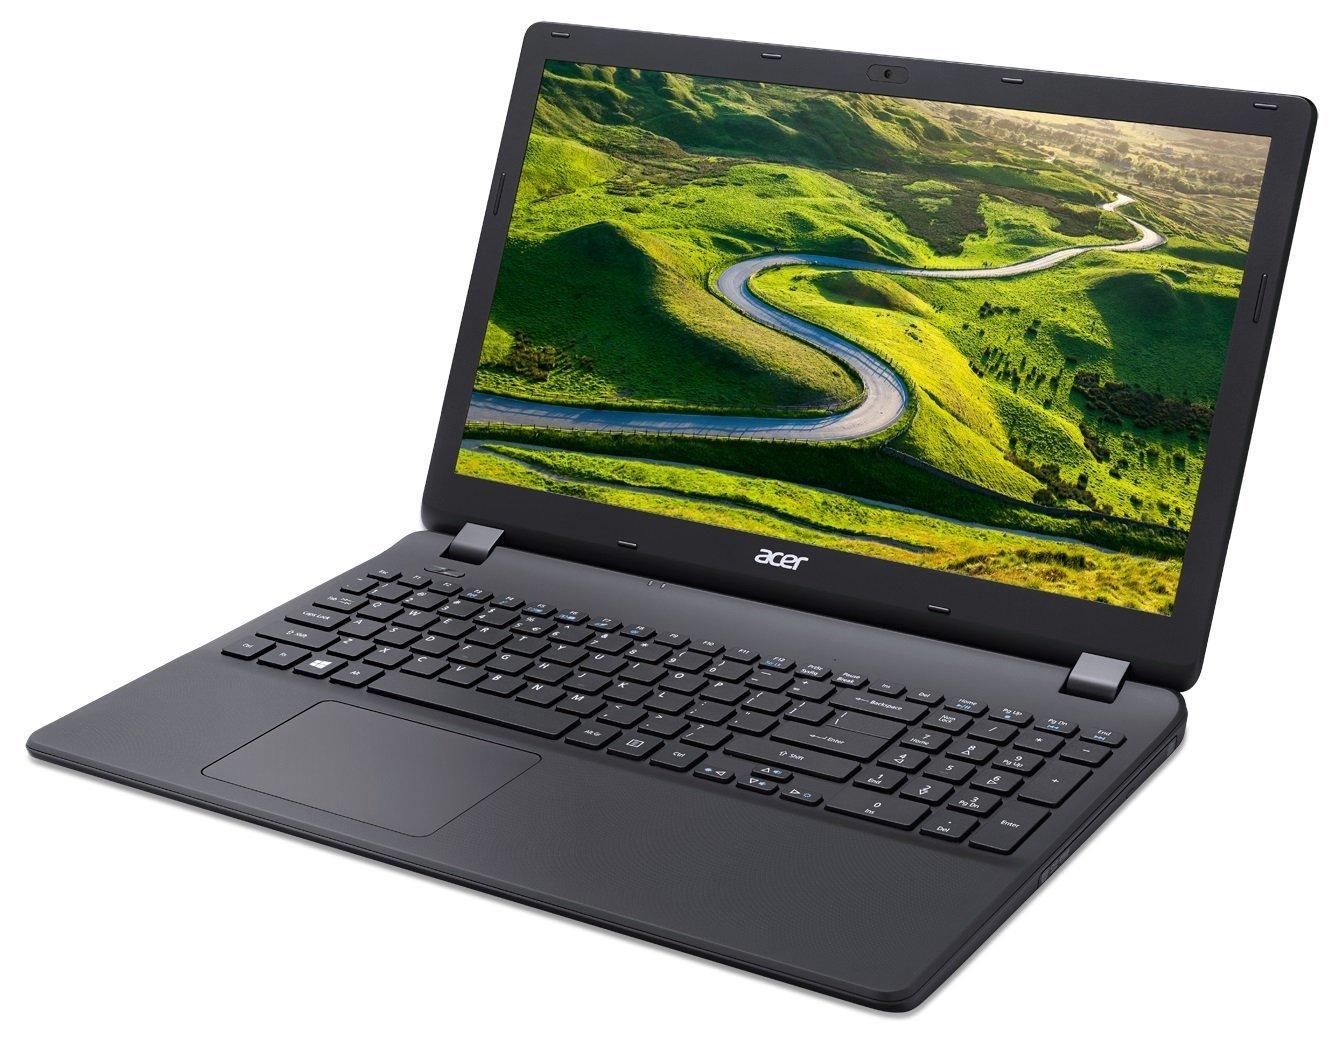 "PC Portable 15.6"" Acer Aspire ES1-571-3357 (Intel Core i3 i3-5005U, 4Go RAM, 500Go HDD, Windows 10)"